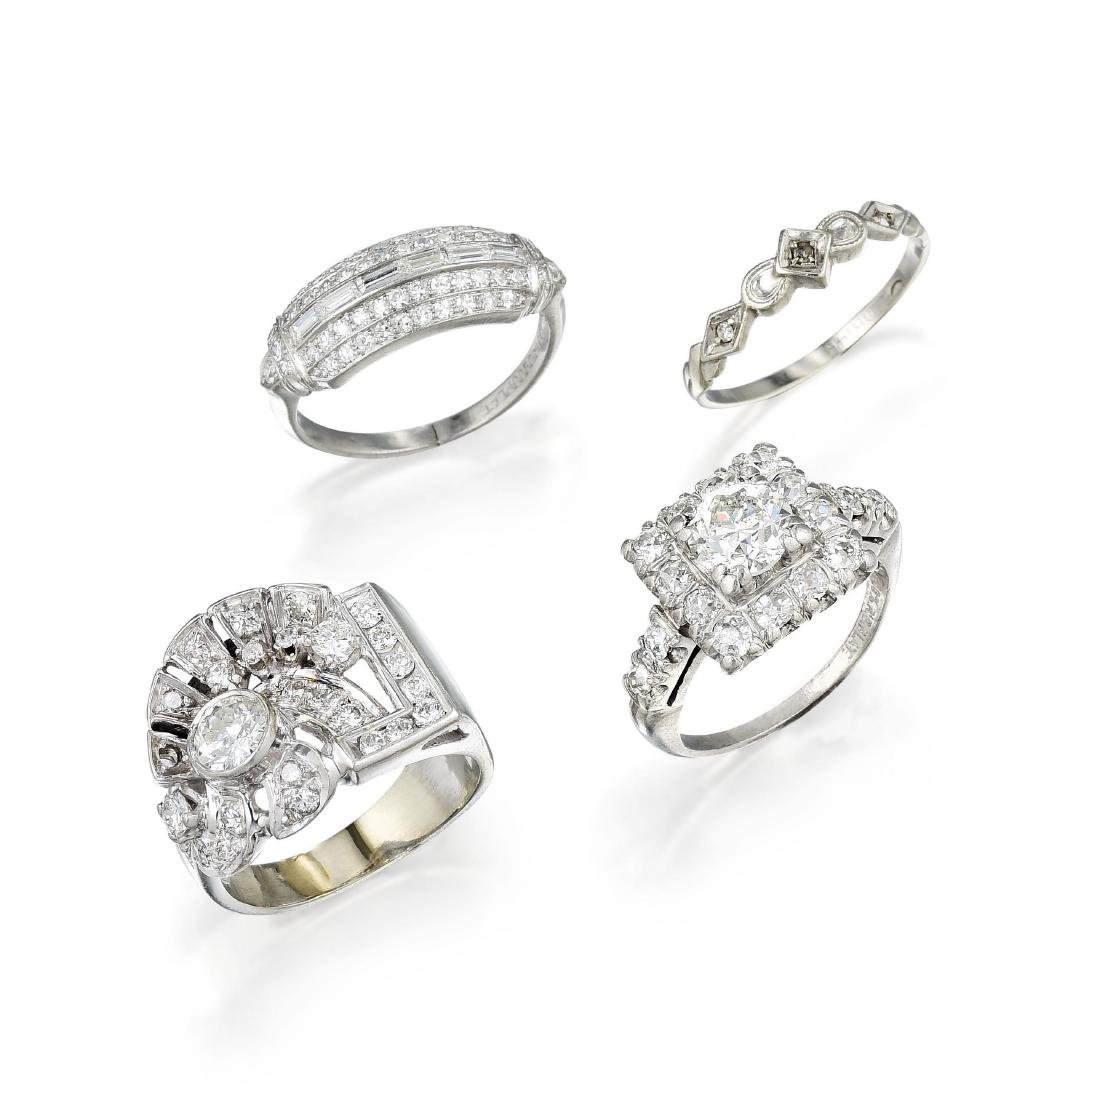 A Group of Art Deco Diamond Rings